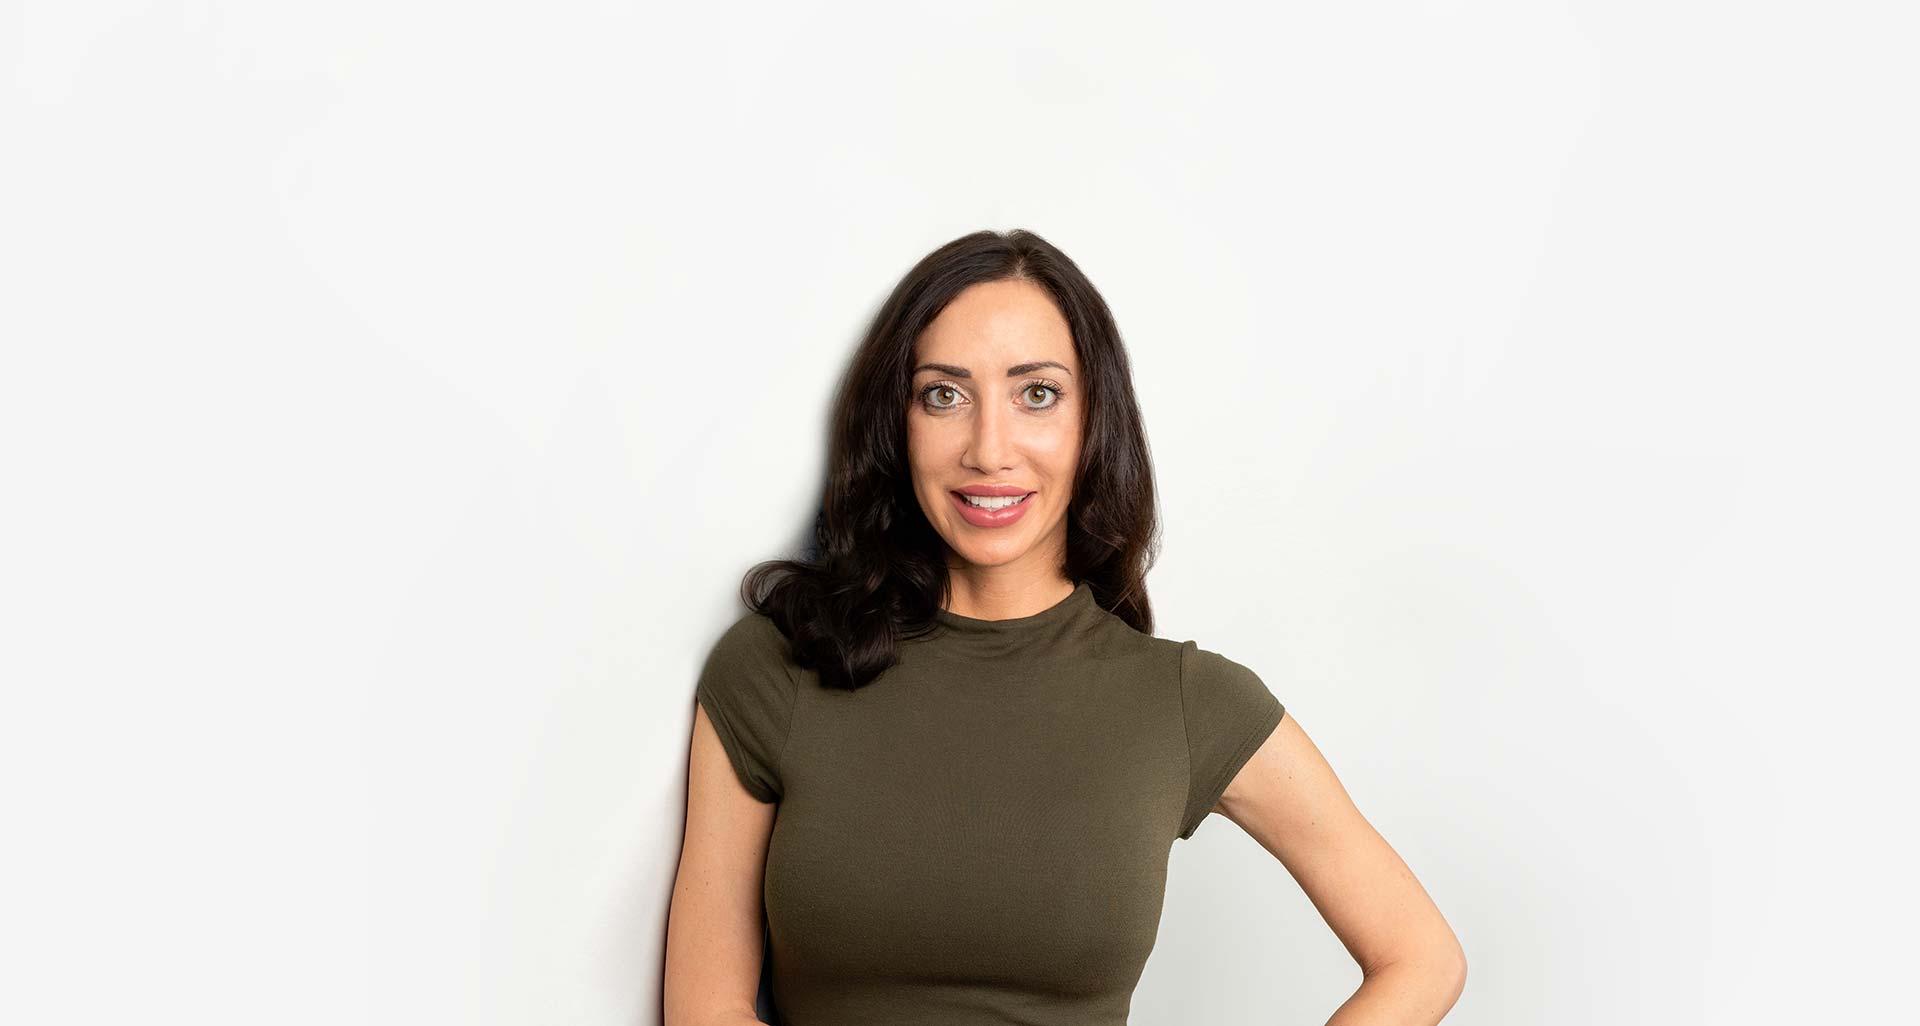 Dr. Kate Balestrieri, PSY.D., CSAT-S